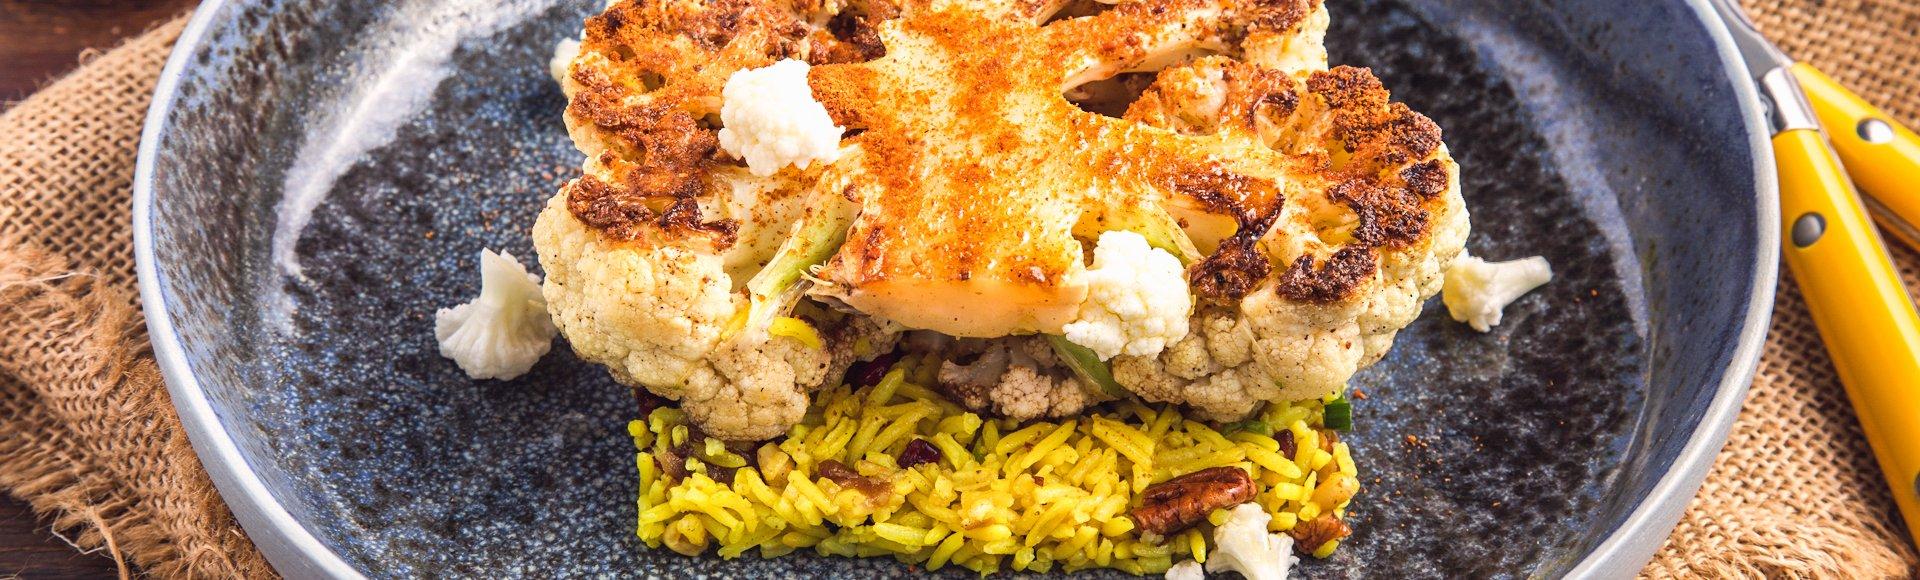 """Steak"" από κουνουπίδι με γιορτινό ρύζι μπασμάτι"